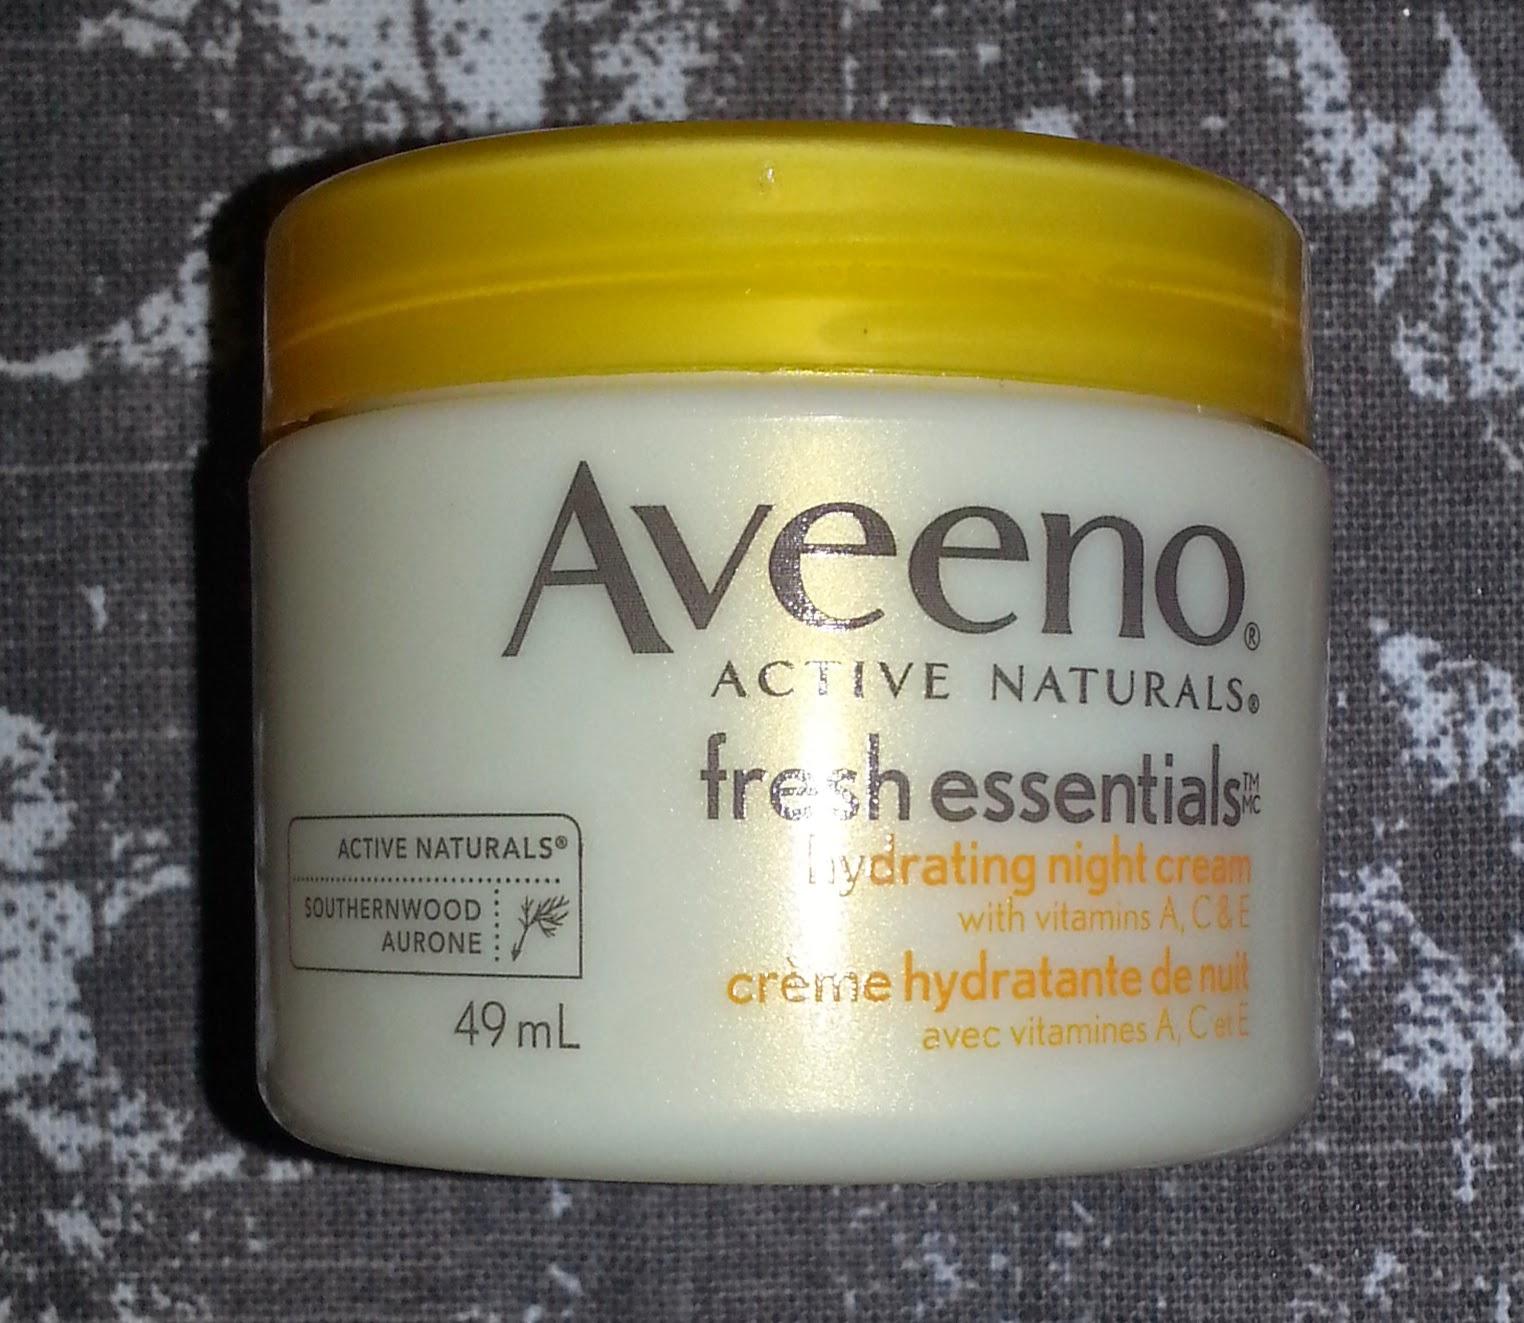 Aveeno Smart Essentials Hydrating Night Cream